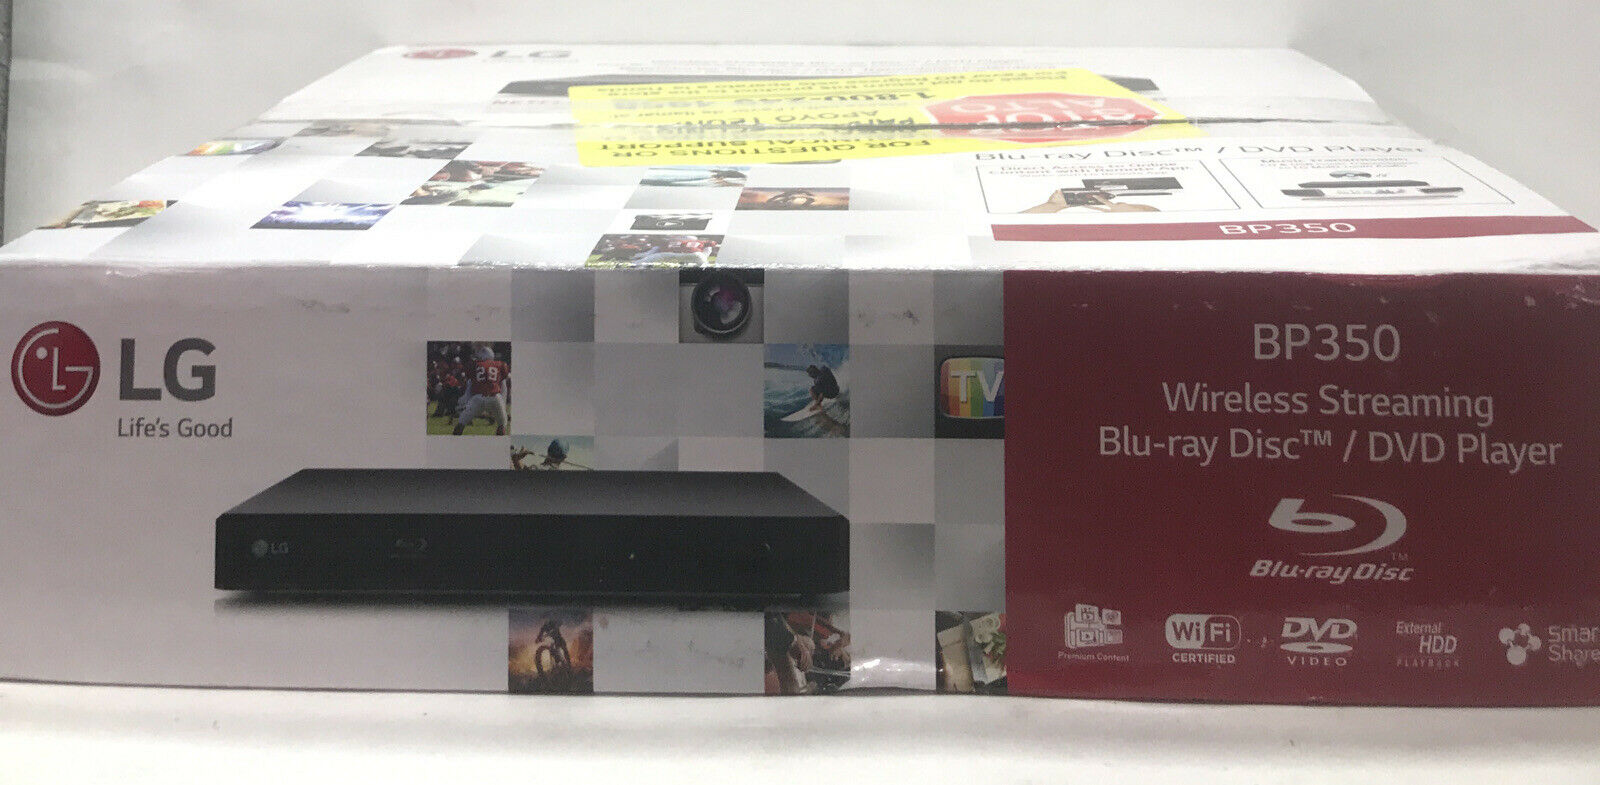 LG Smart 1080p Blu Ray DVD Player w/ Built-In WiFi & Streaming Services | BP350 1080p blu bp350 dvd player ray services smart streaming wifi